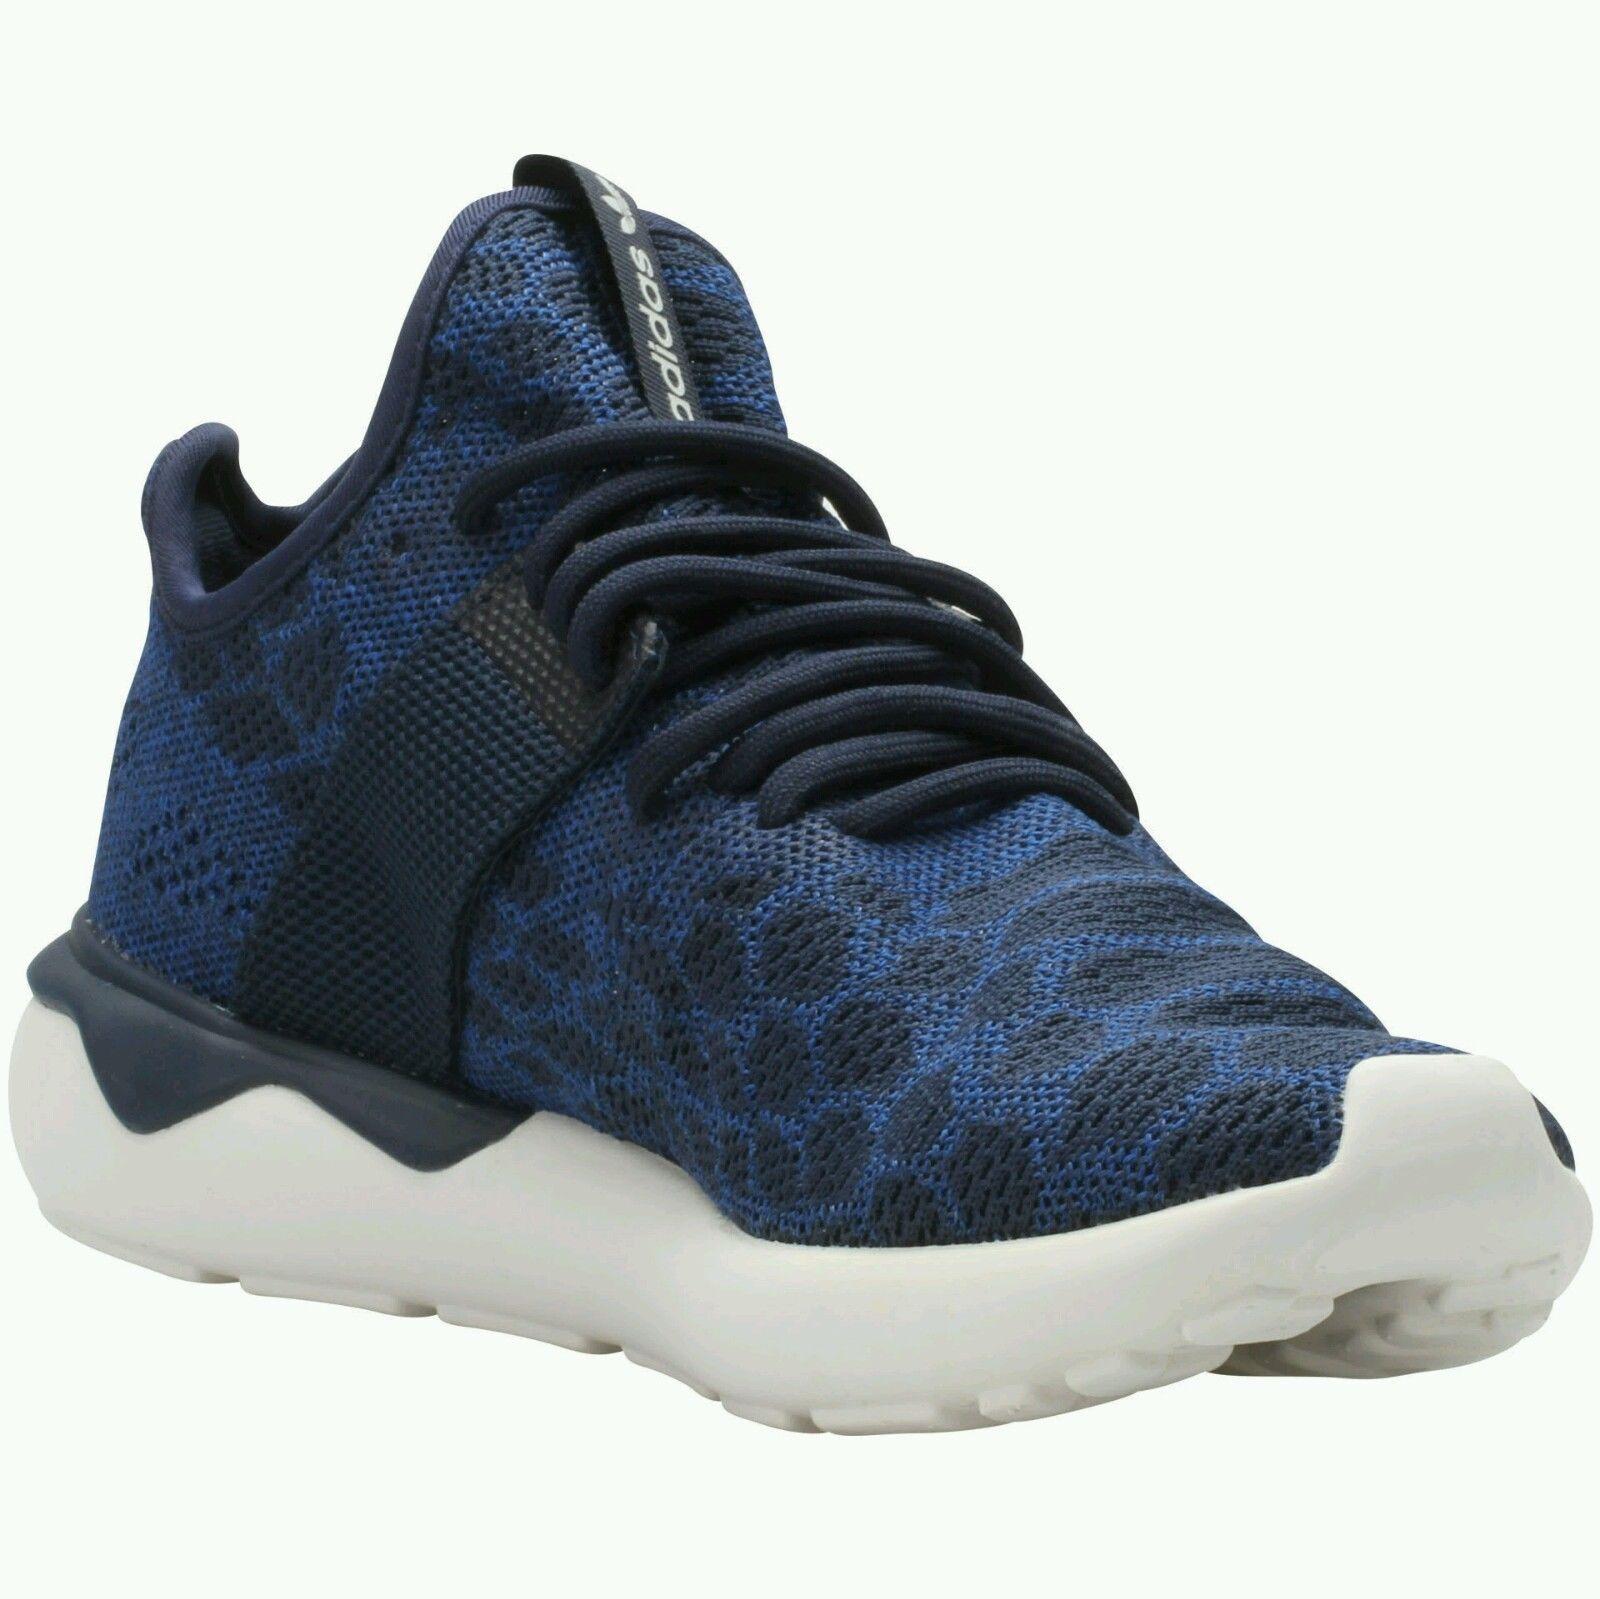 New Mens adidas Originals Tubular Runner Primeknit Shoes 11 Navy Blue S81628